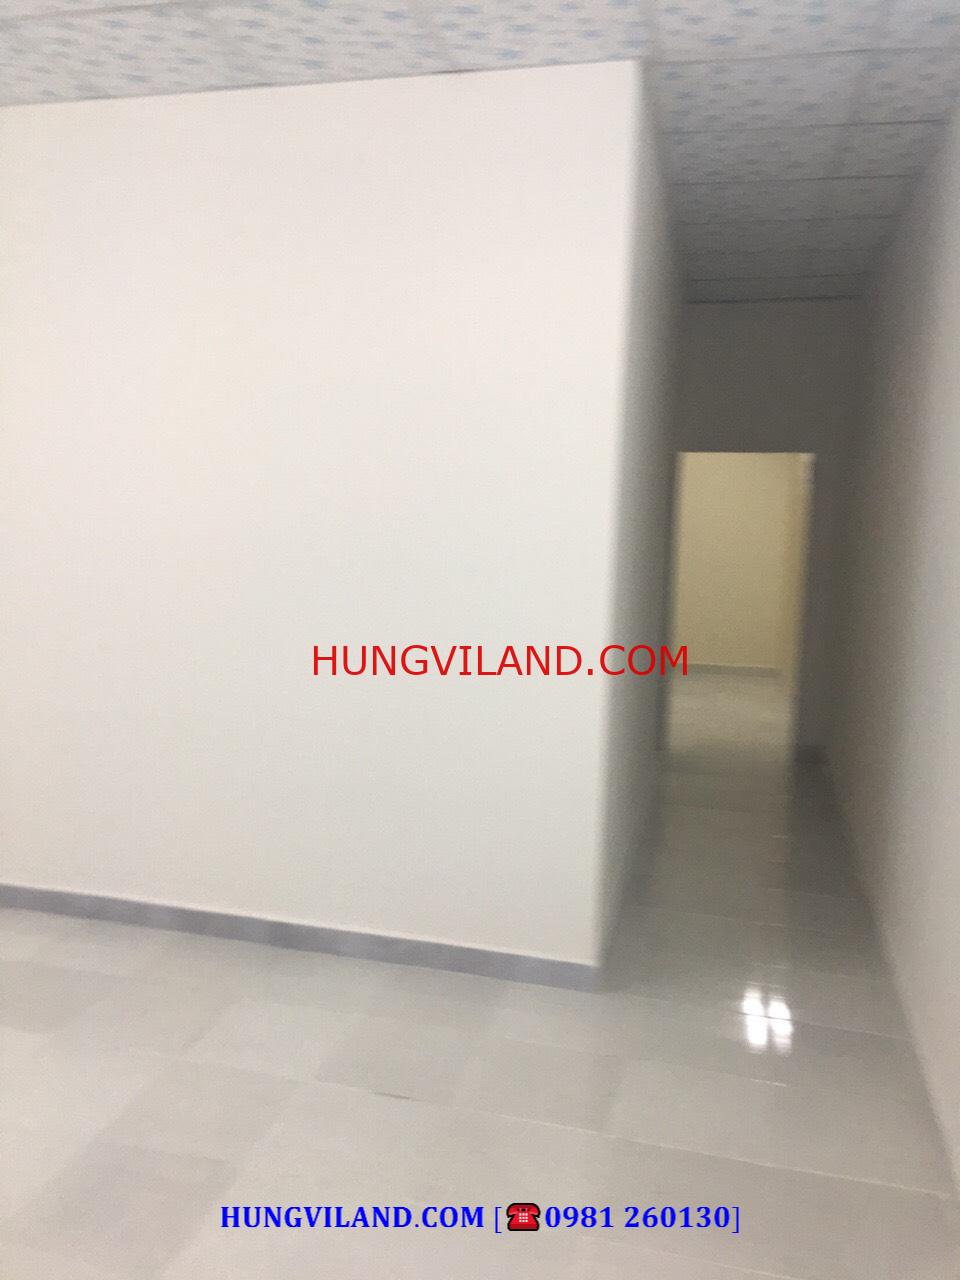 http://hungviland.com/wp-content/uploads/2020/03/z1804573857459_6c1e519a321b41a2e47b296ca2de8434.png